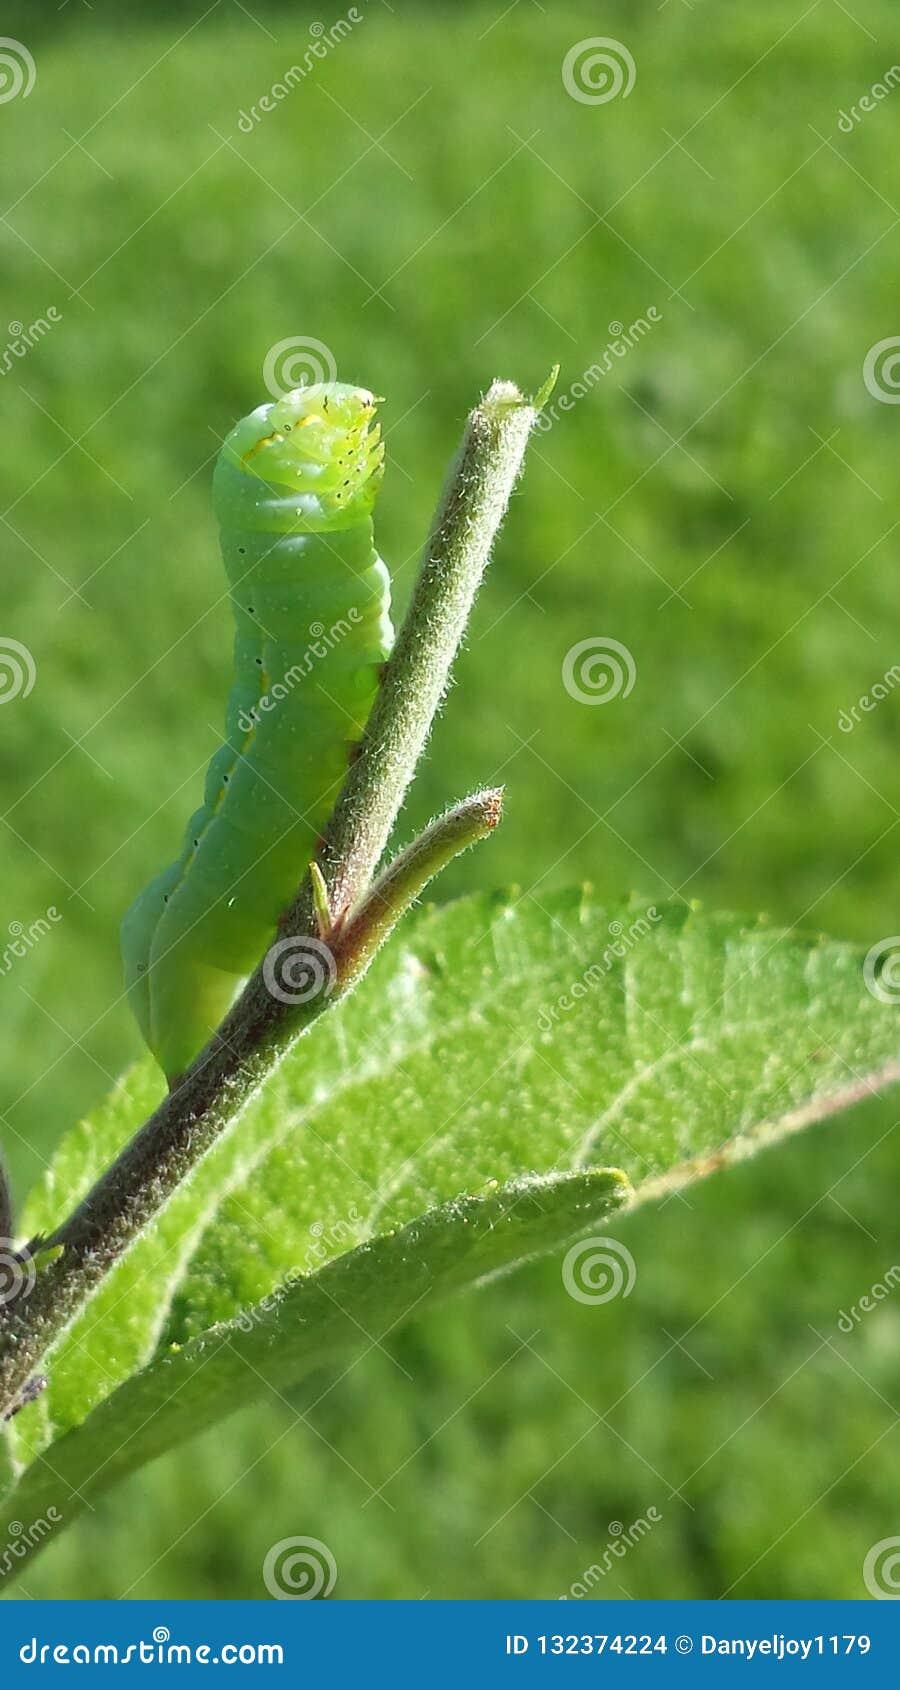 Tomato Caterpillar Having a Snack